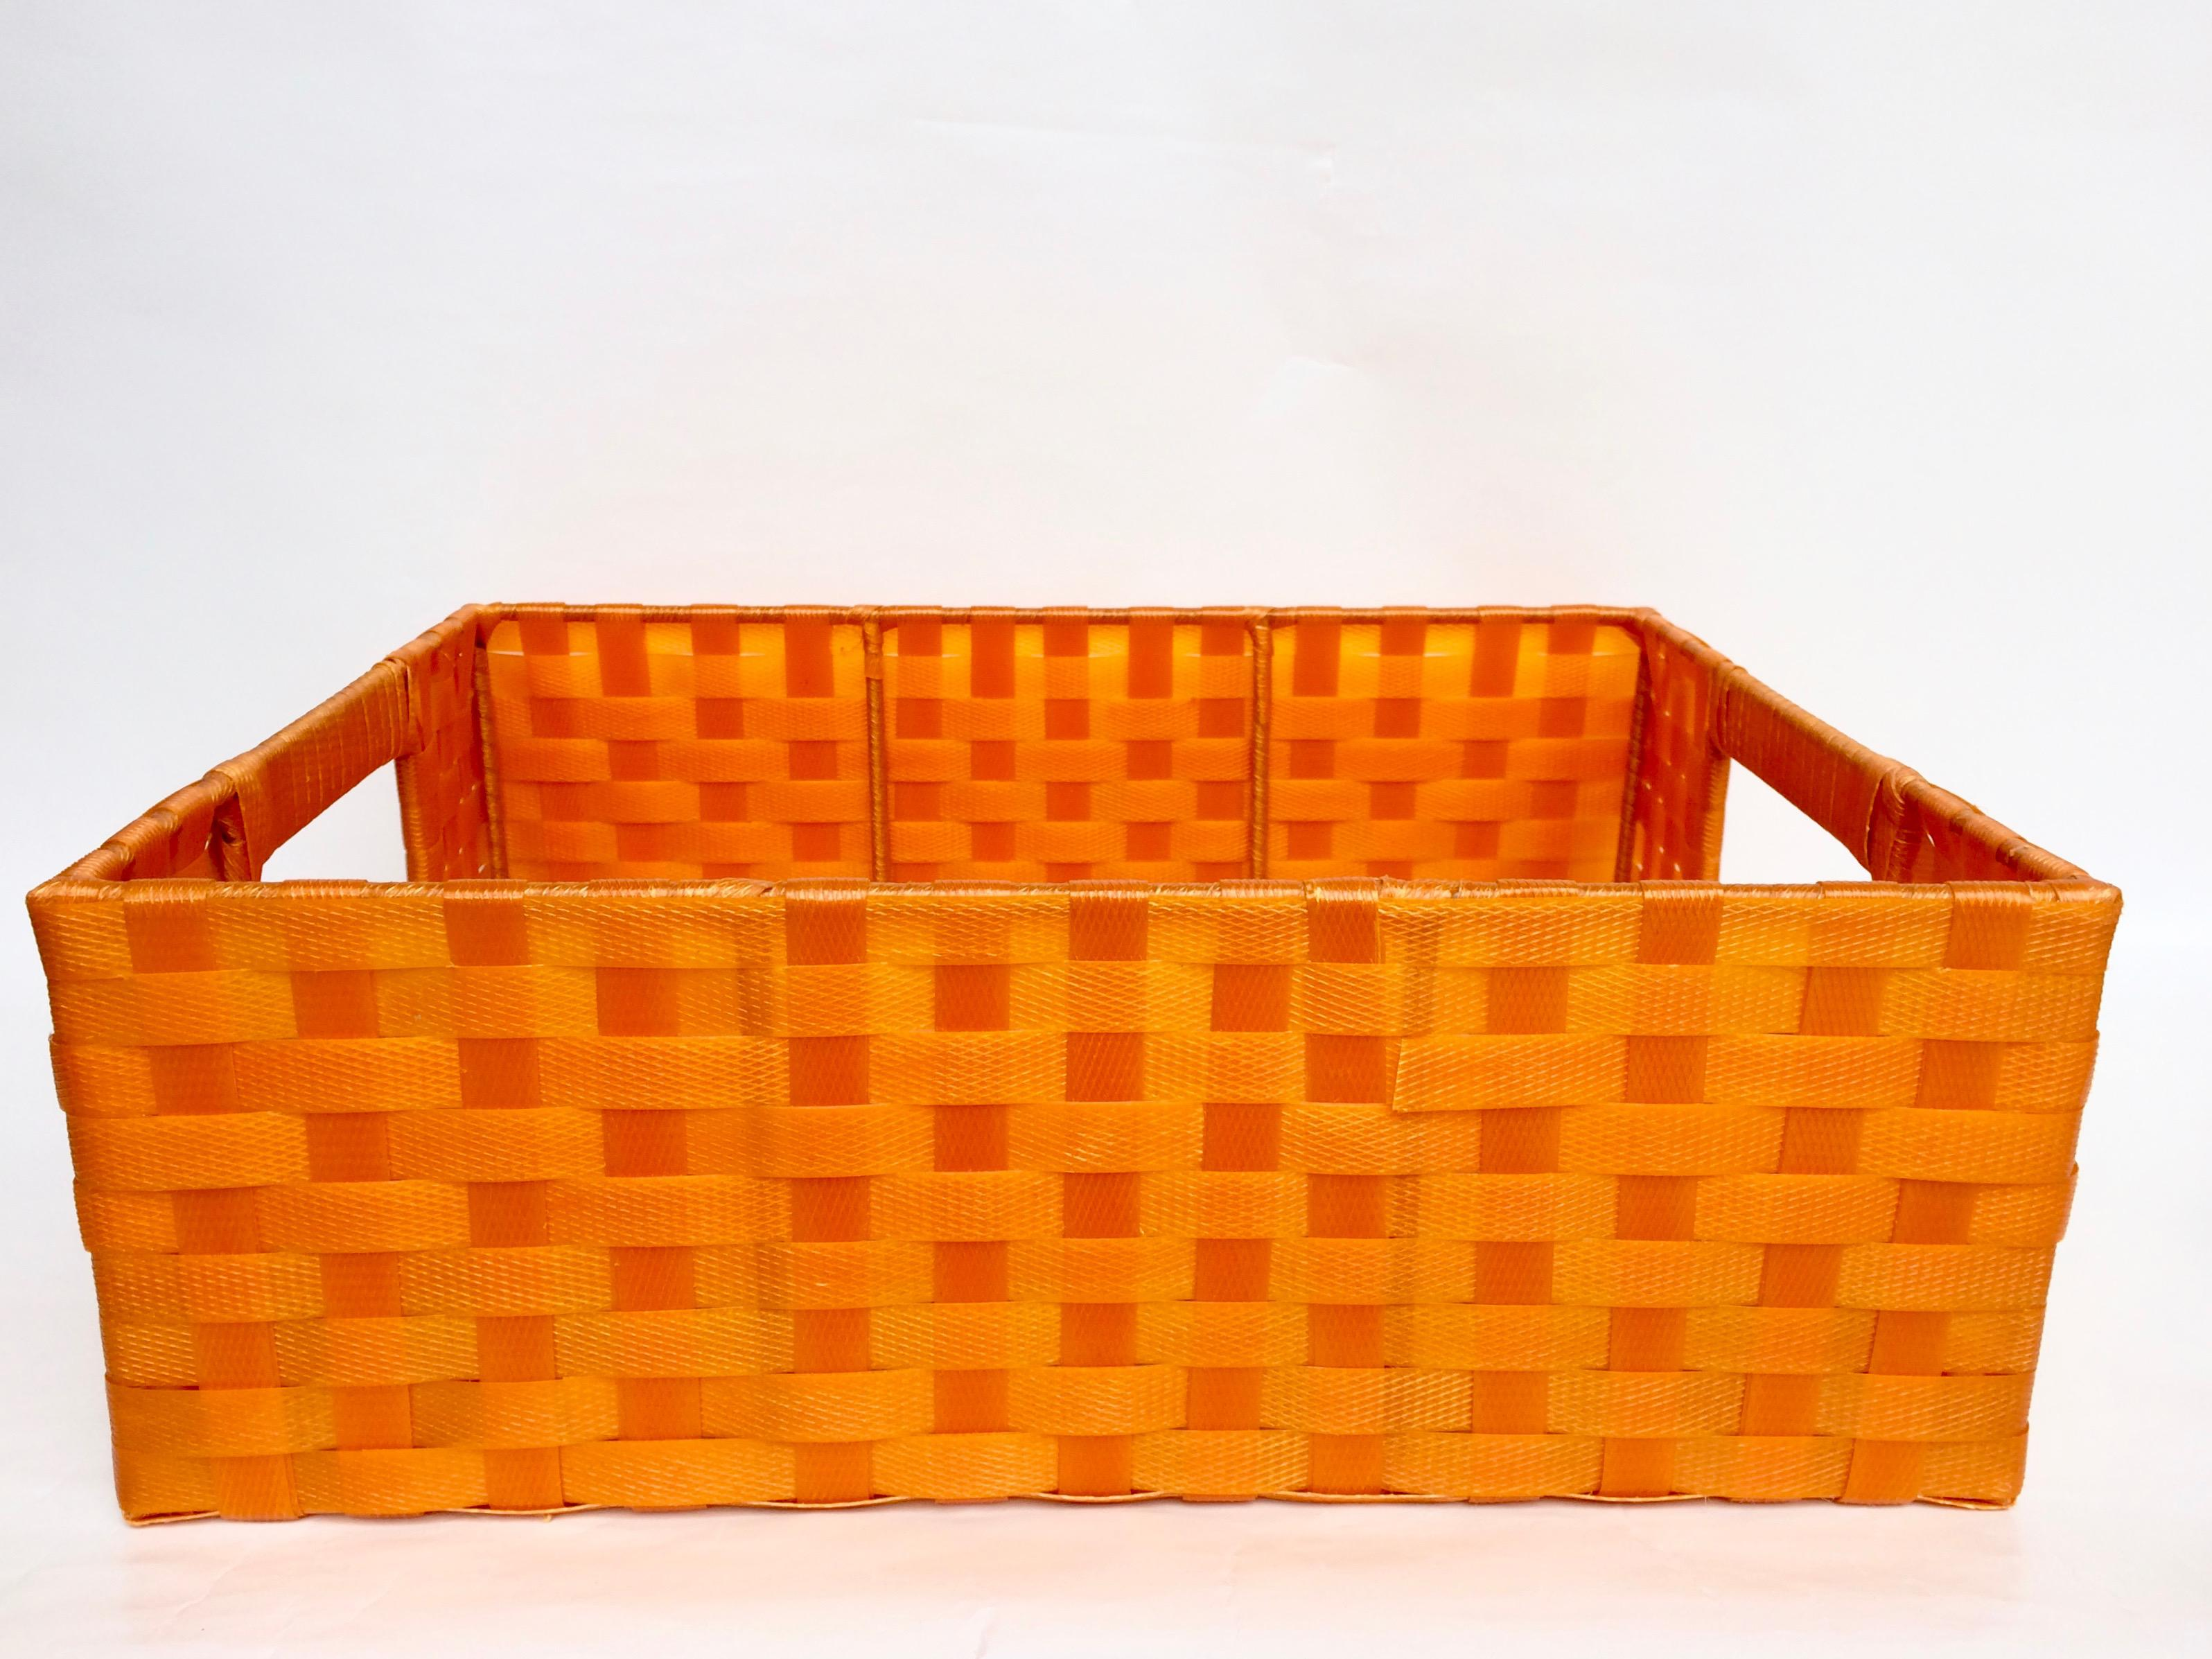 Vintage Woven Plastic Storage Baskets   Set Of 3   Image 8 Of 9